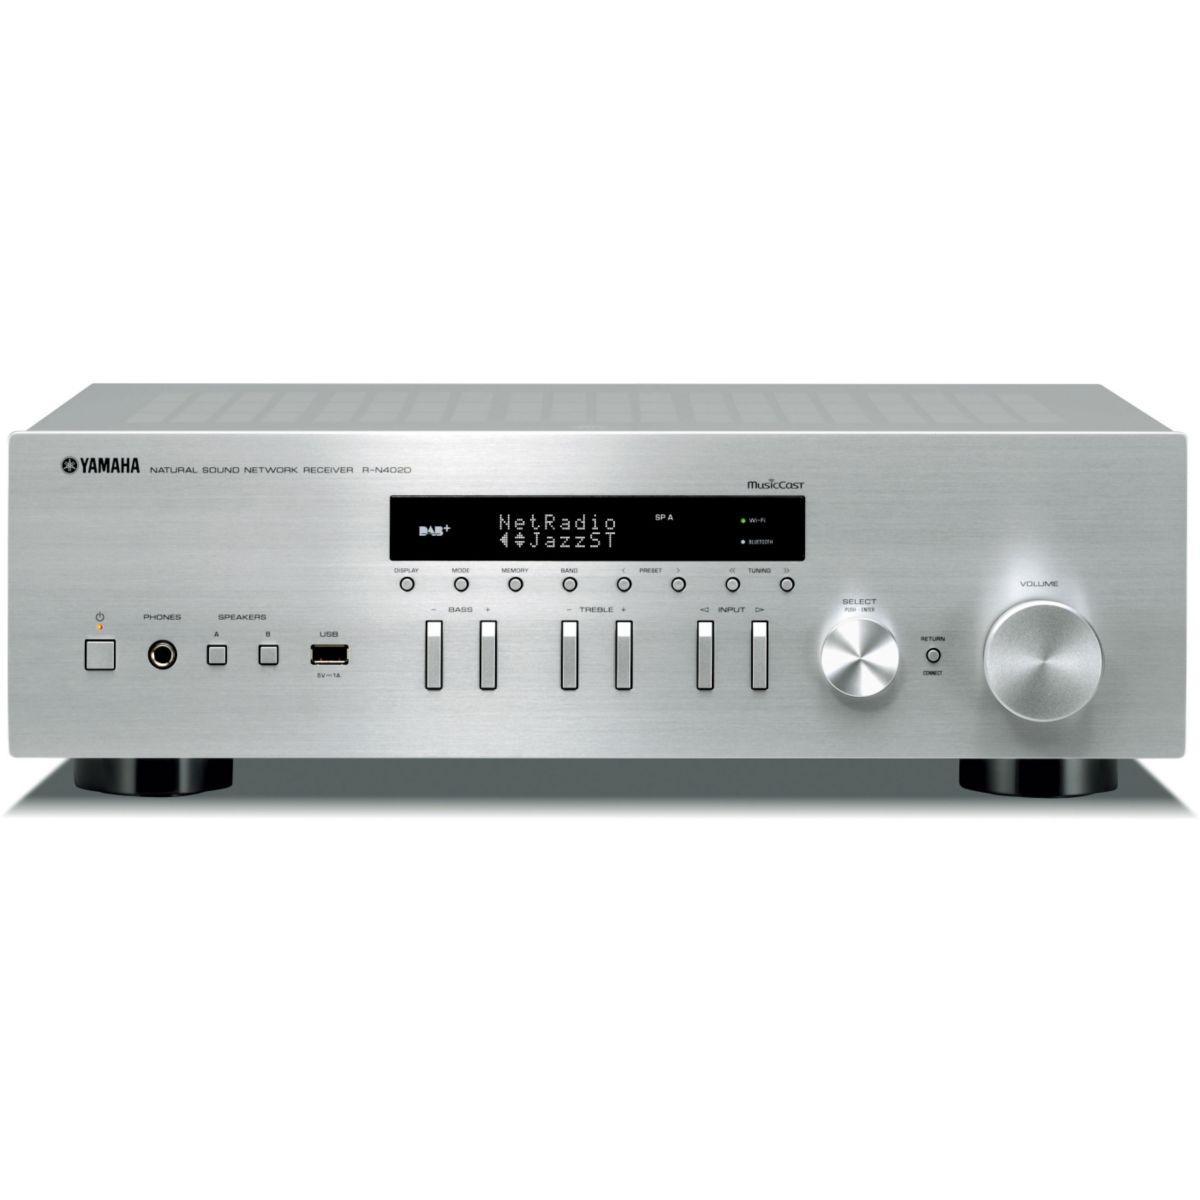 Amplificateur hifi yamaha musiccast rn402 silver - livraison o...